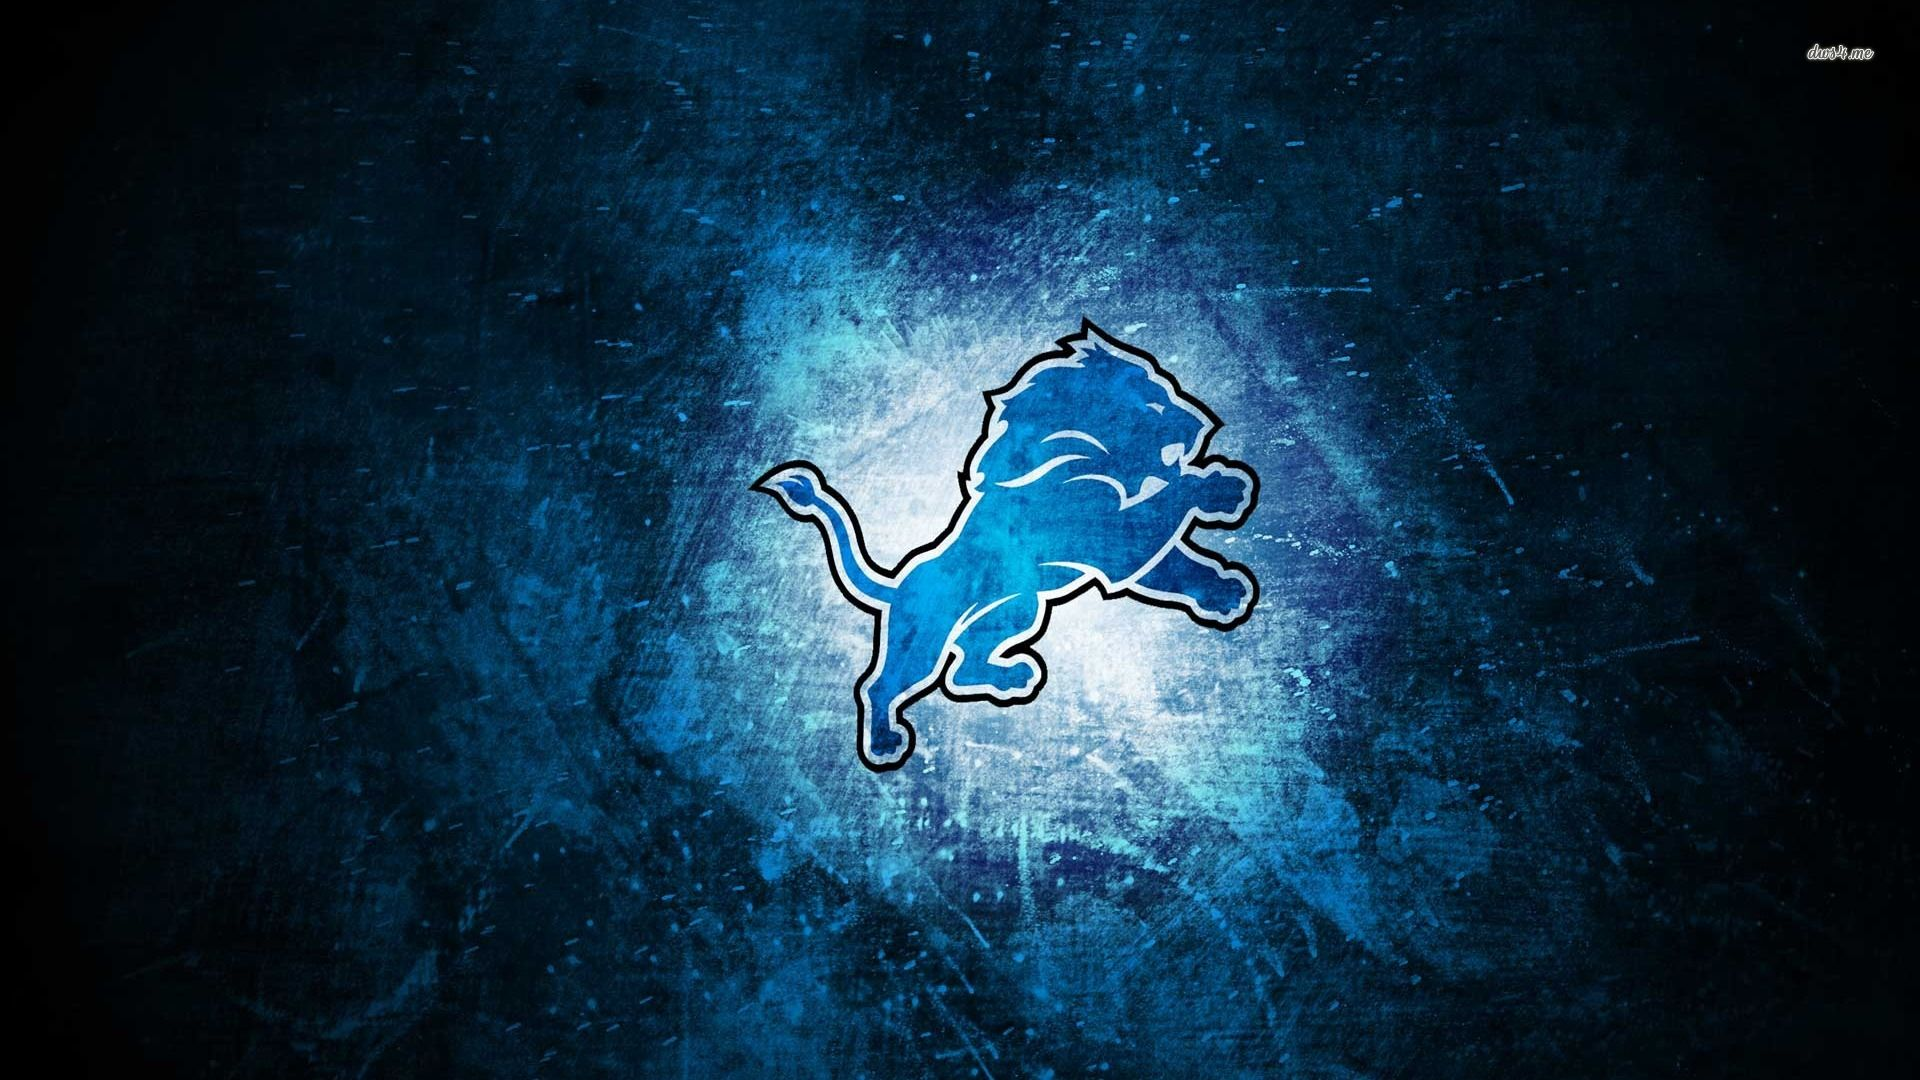 Detroit Lions Screensaver Wallpaper Detroit Lions Wallpaper Detroit Lions Detroit Lions Logo